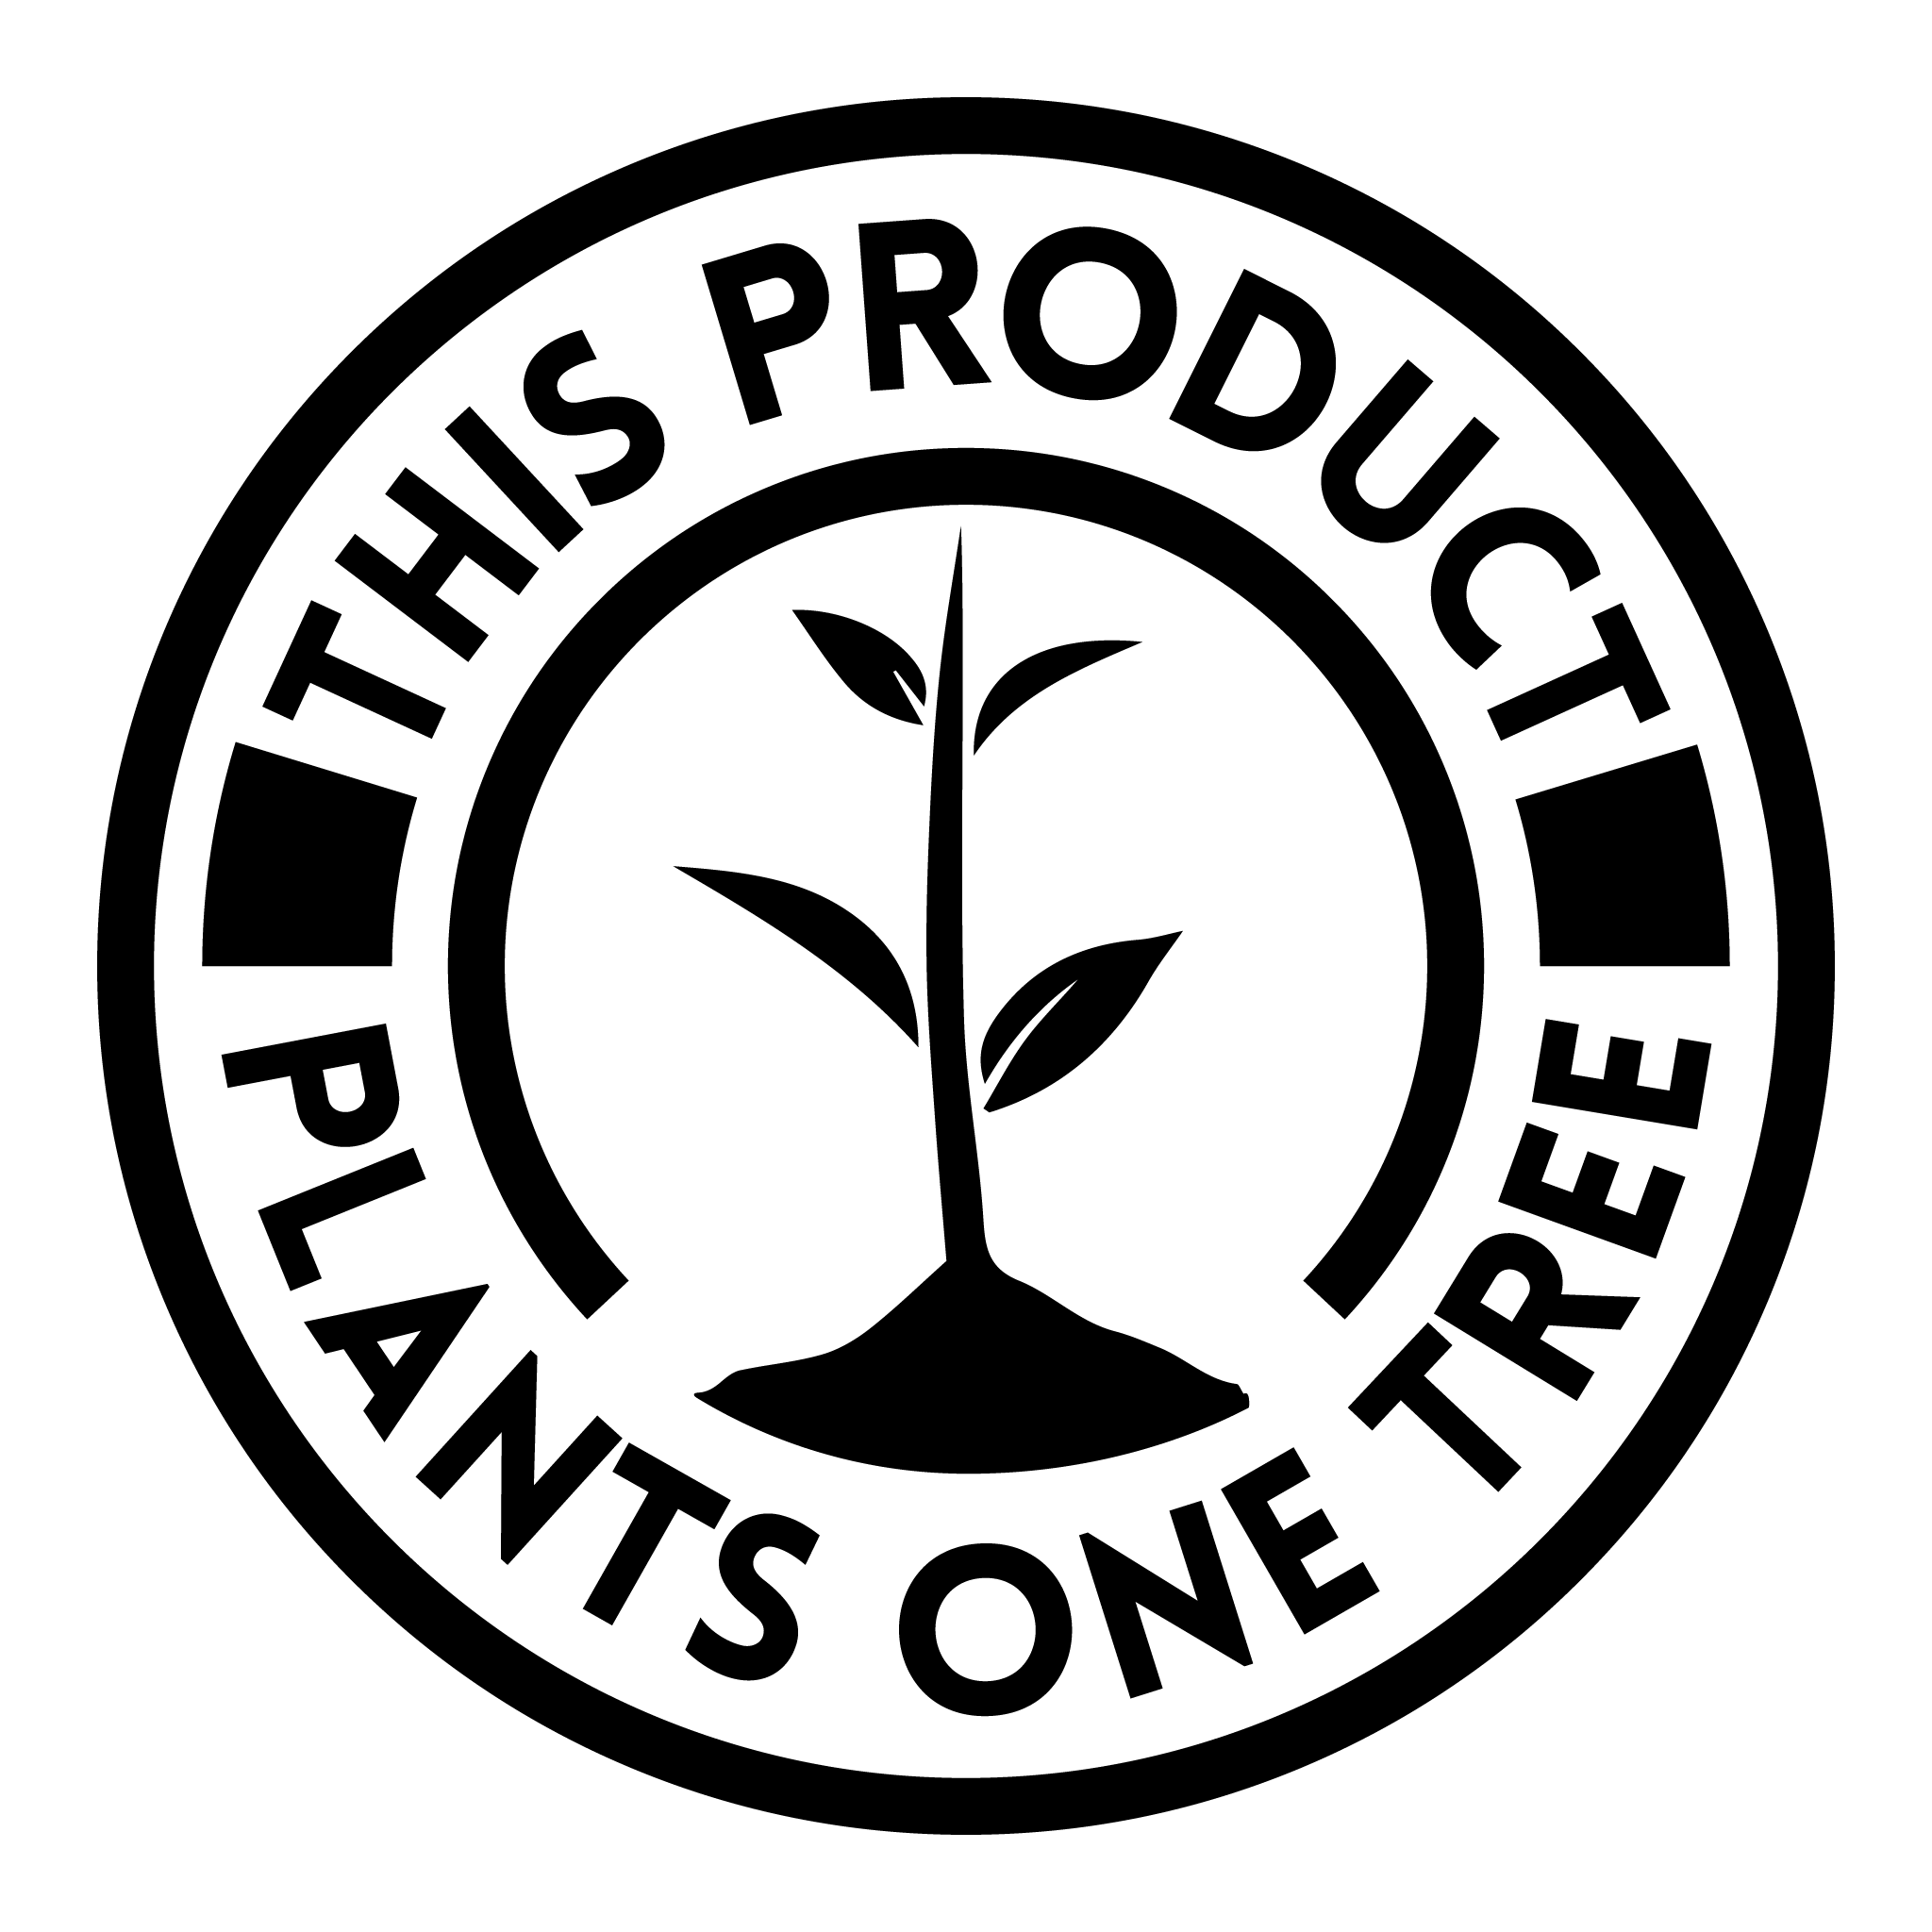 OneTreeStampDesignClean (1).png